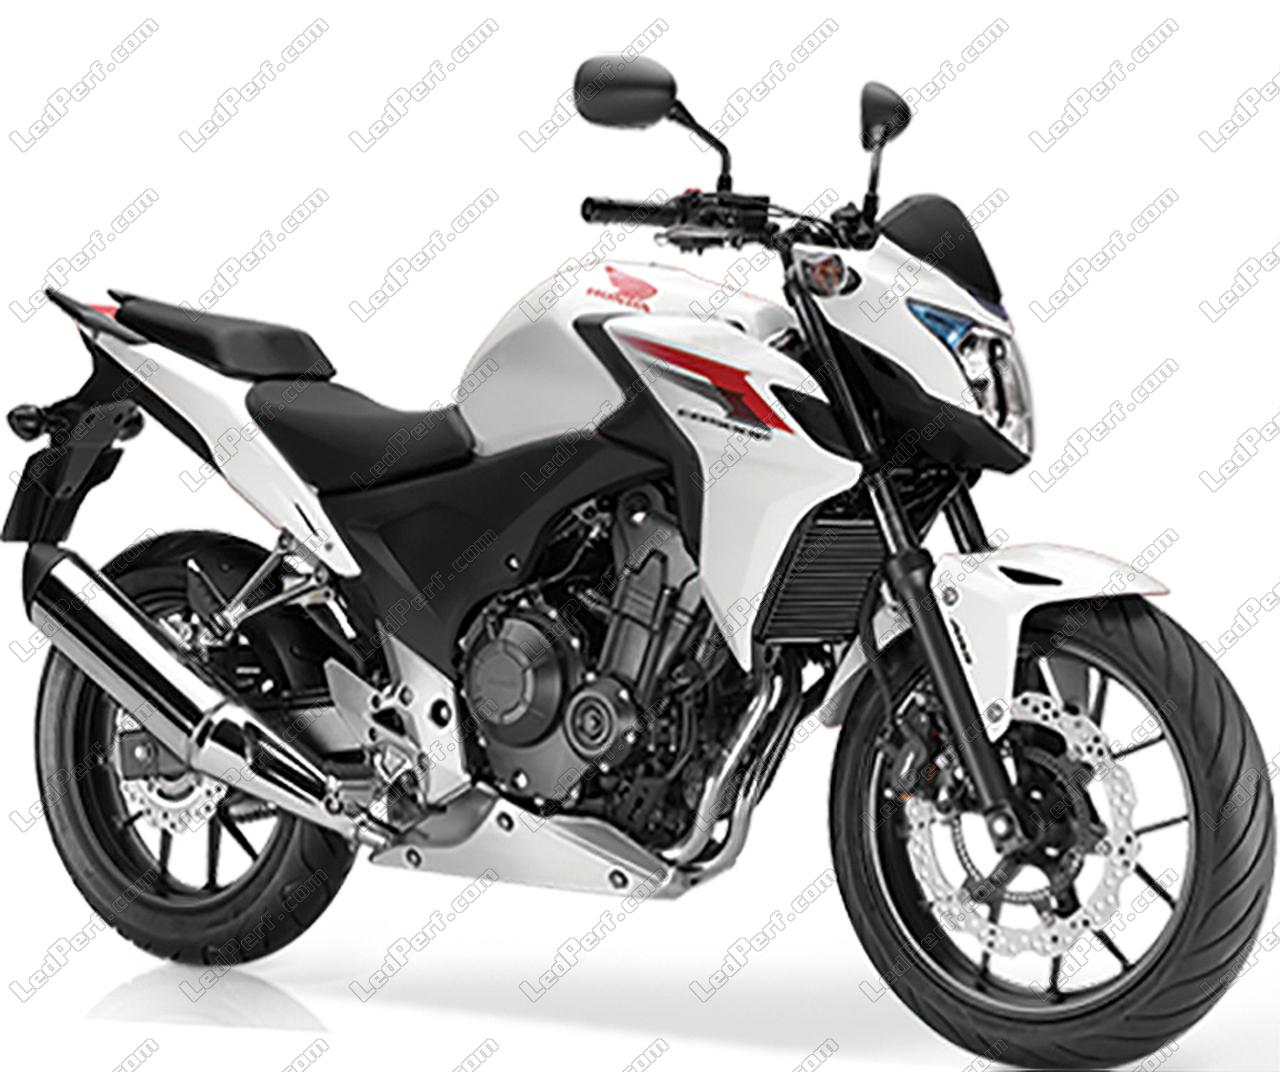 2013 Honda CB500F Detailed, Official Price Revealed